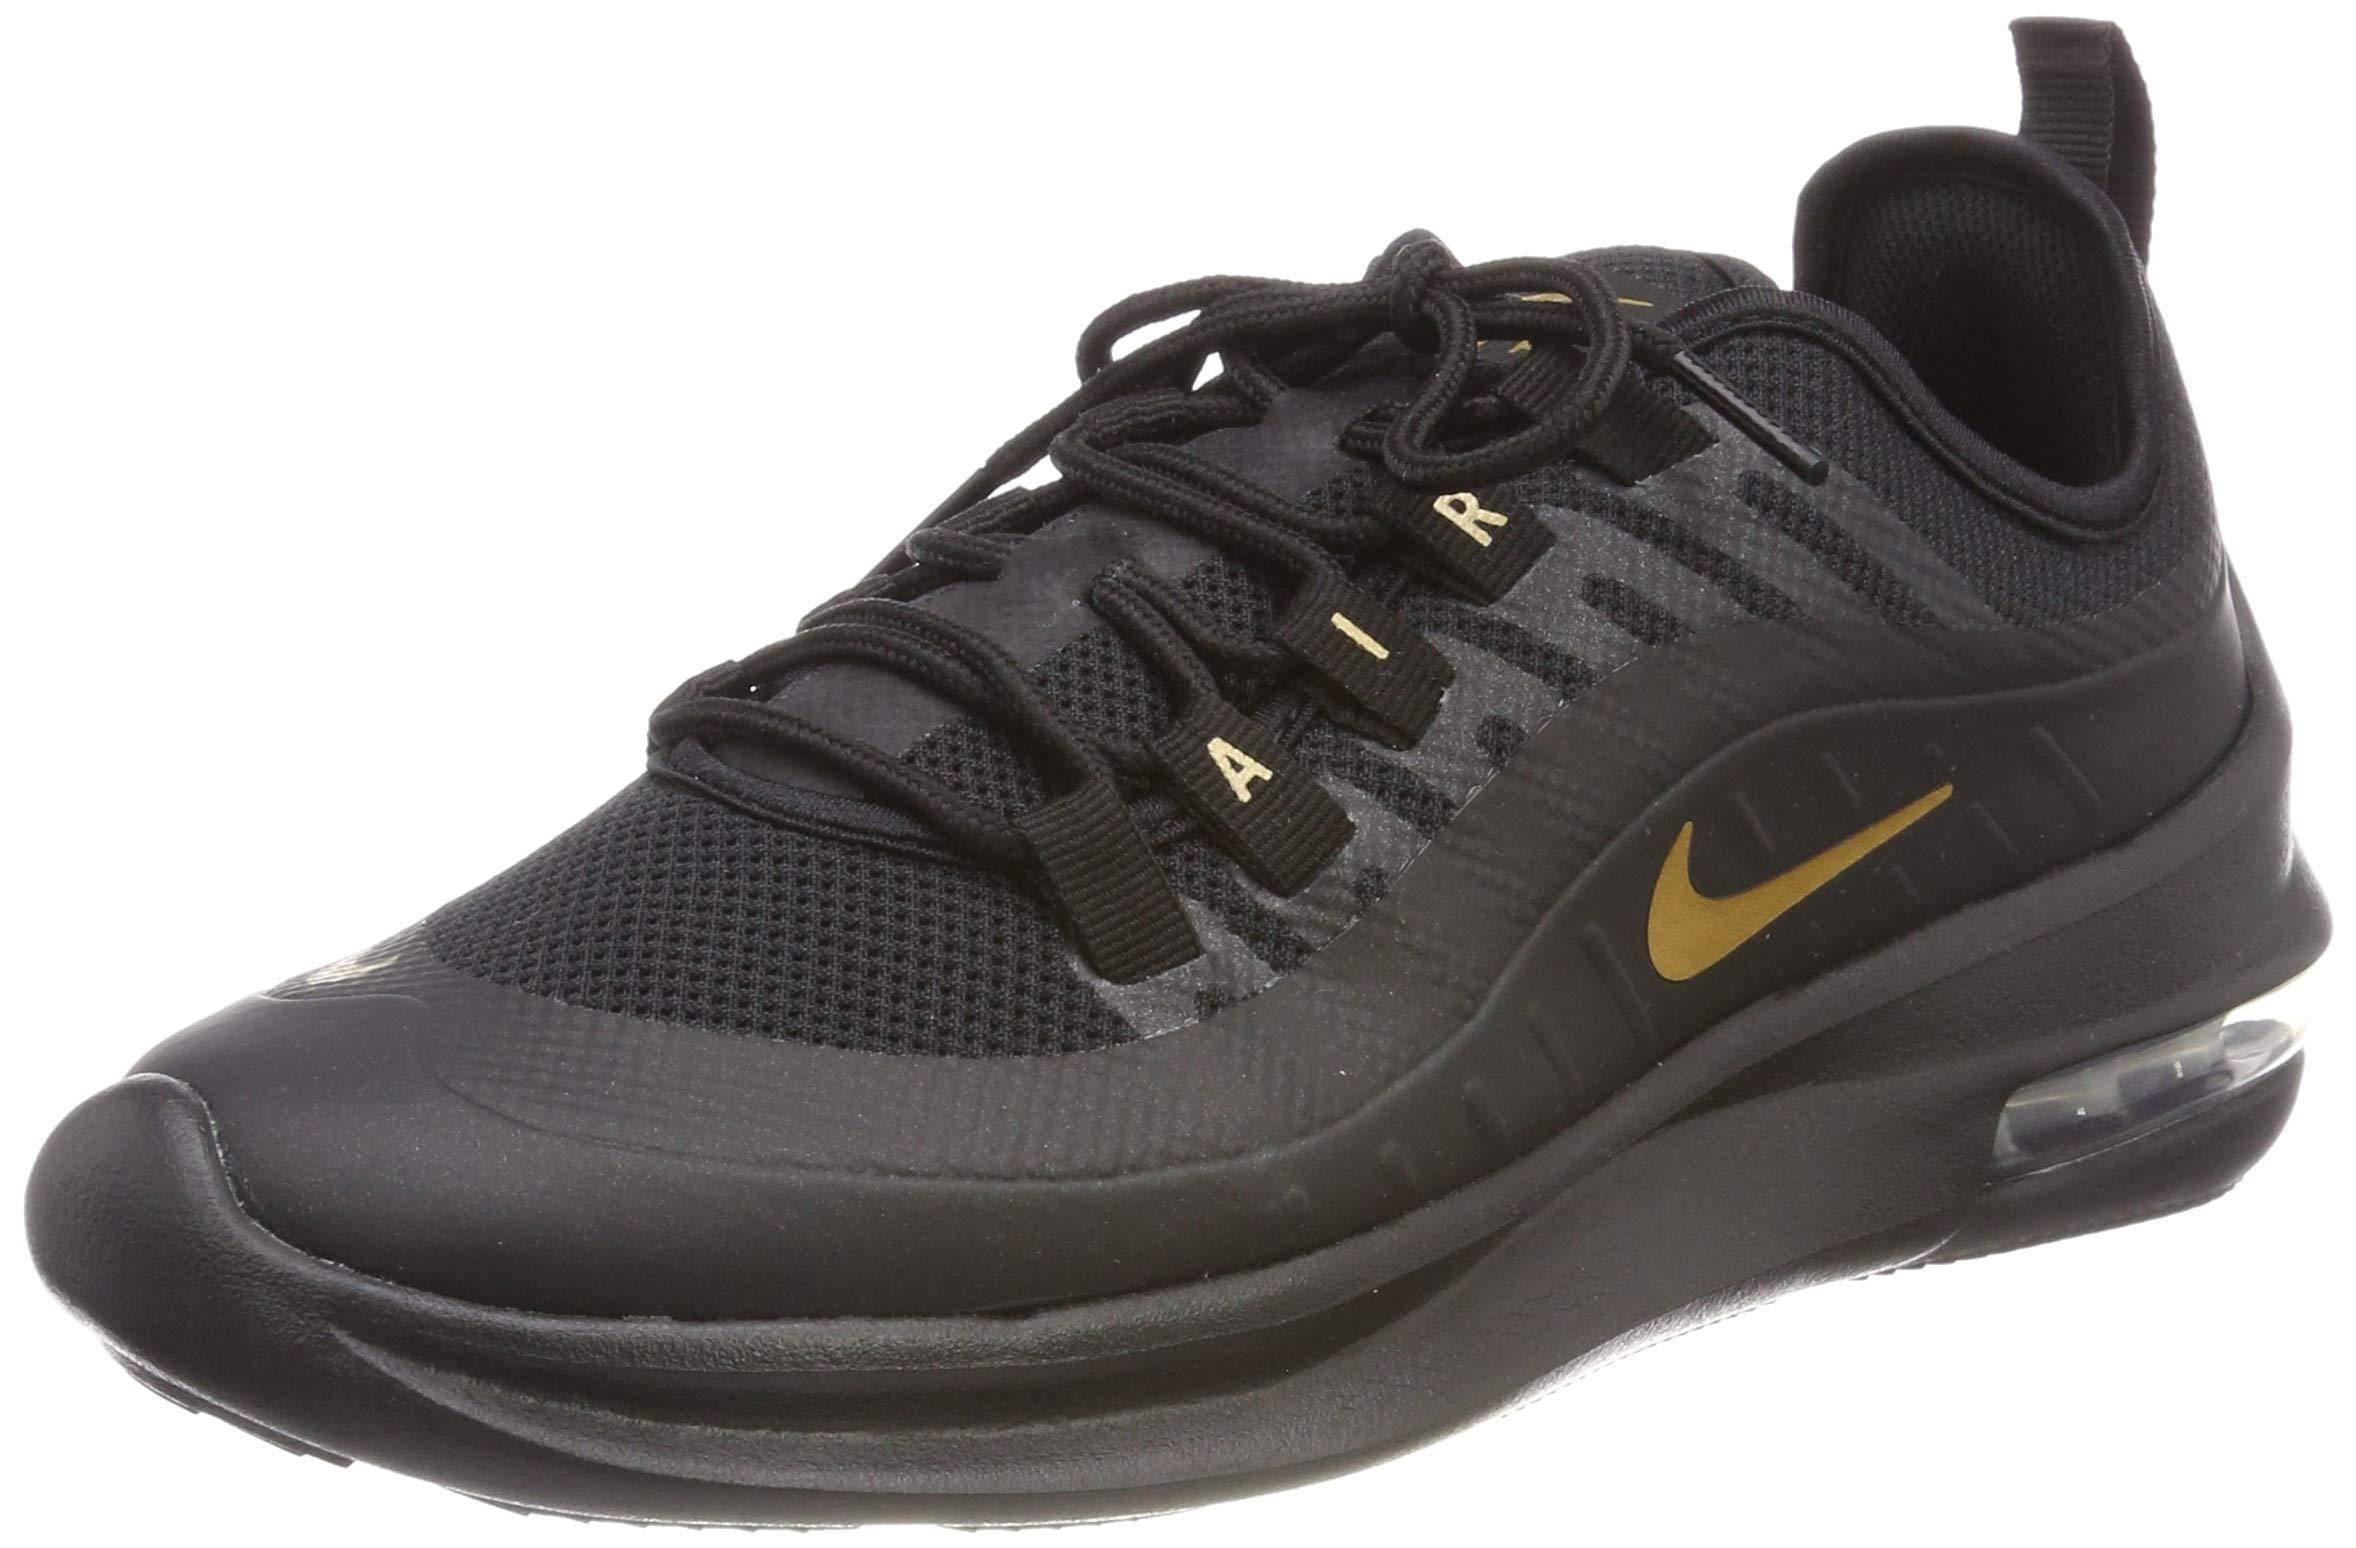 ad4ada03f0 Galleon - Nike Women s Air Max Axis Running Shoe